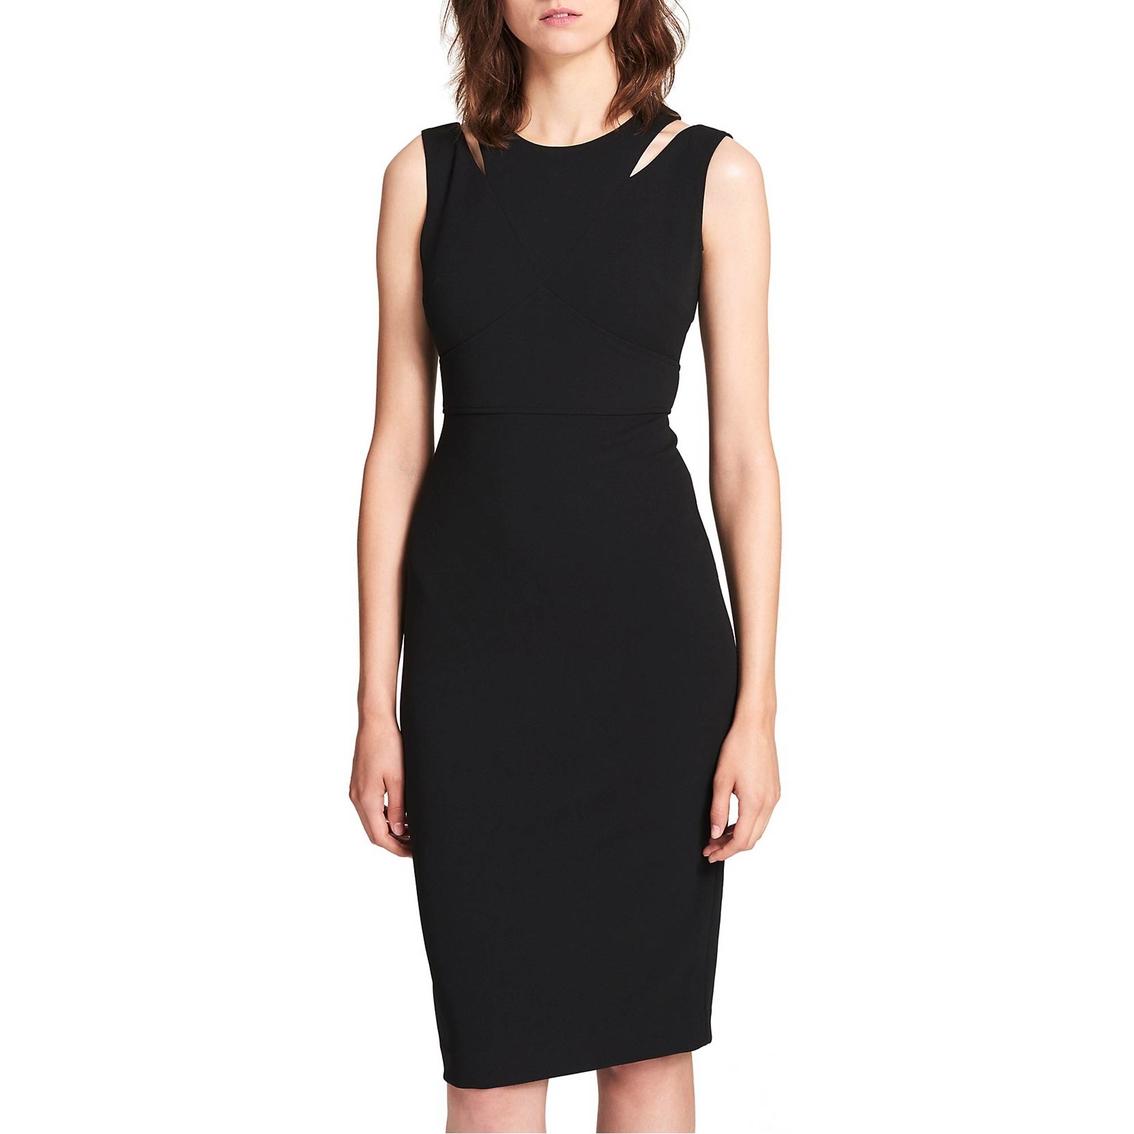 Calvin Klein Ck Cutout Shoulder Sheath Dress | Dresses | Apparel ...